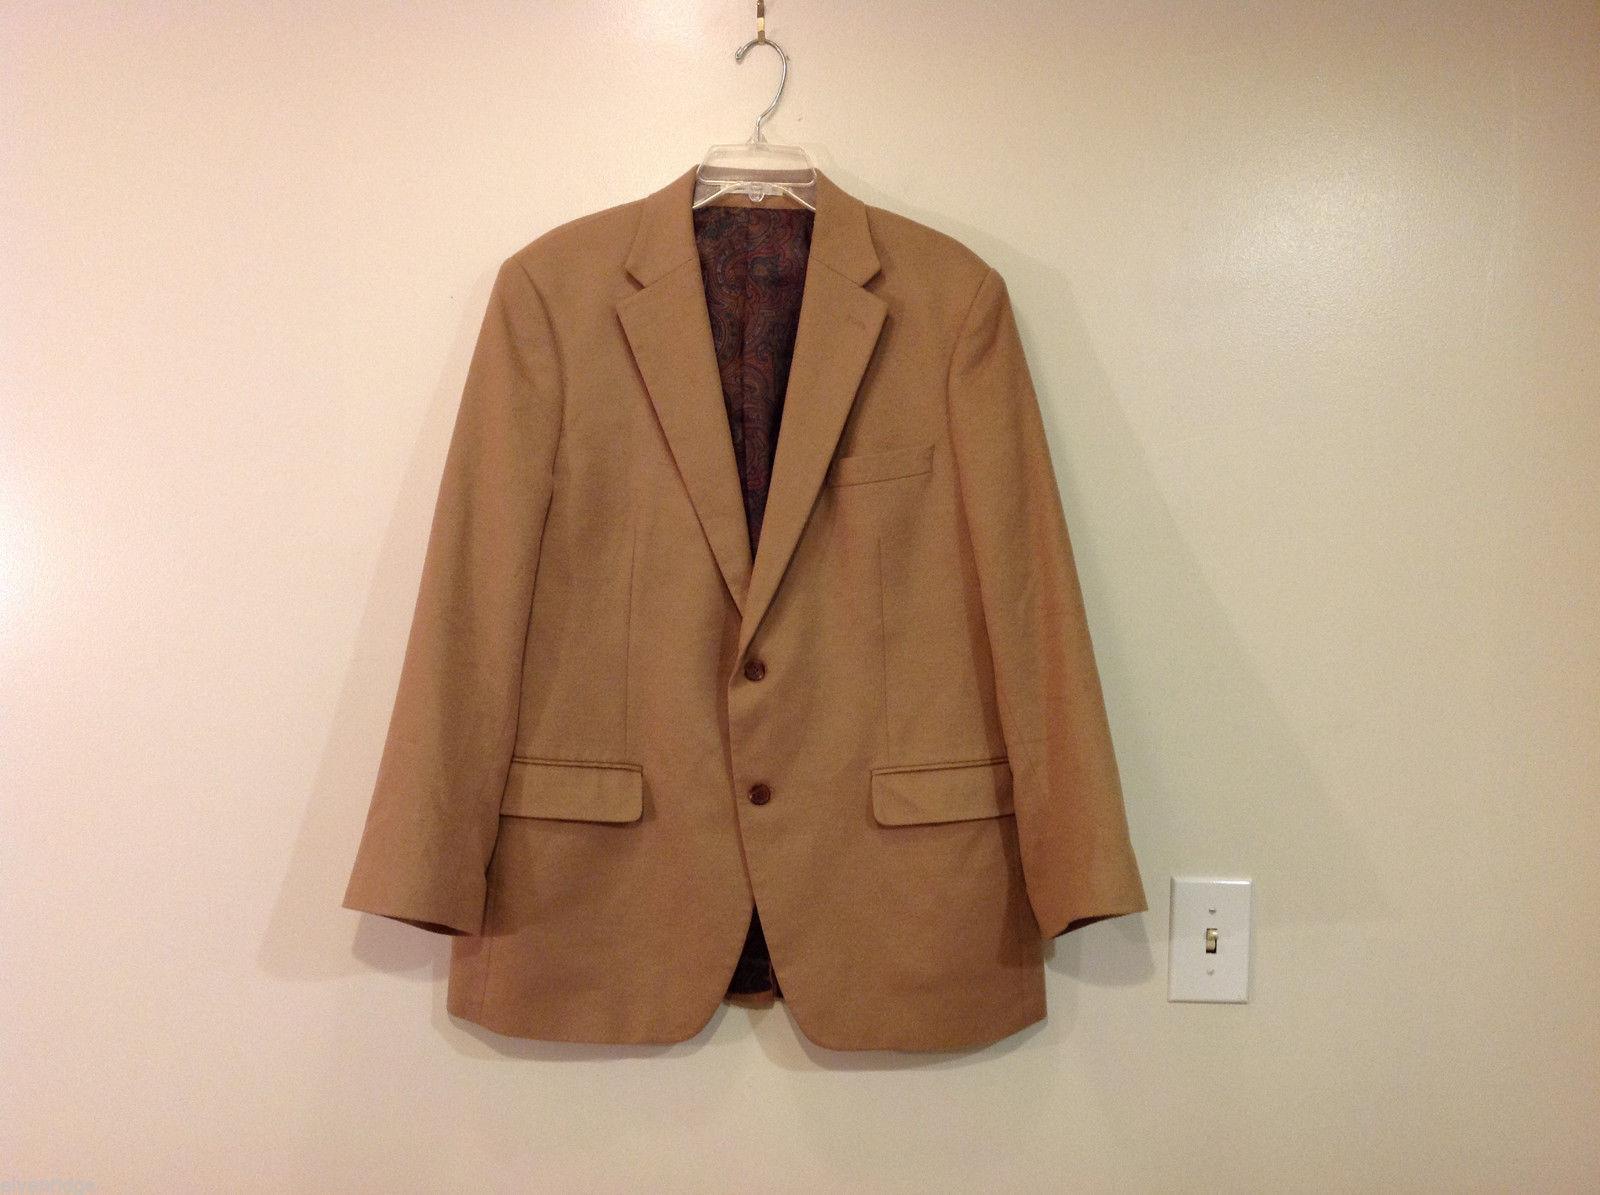 Lauren by Ralph Lauren Two Buttons Sand Brown Blazer Suit Jacket Size 43R